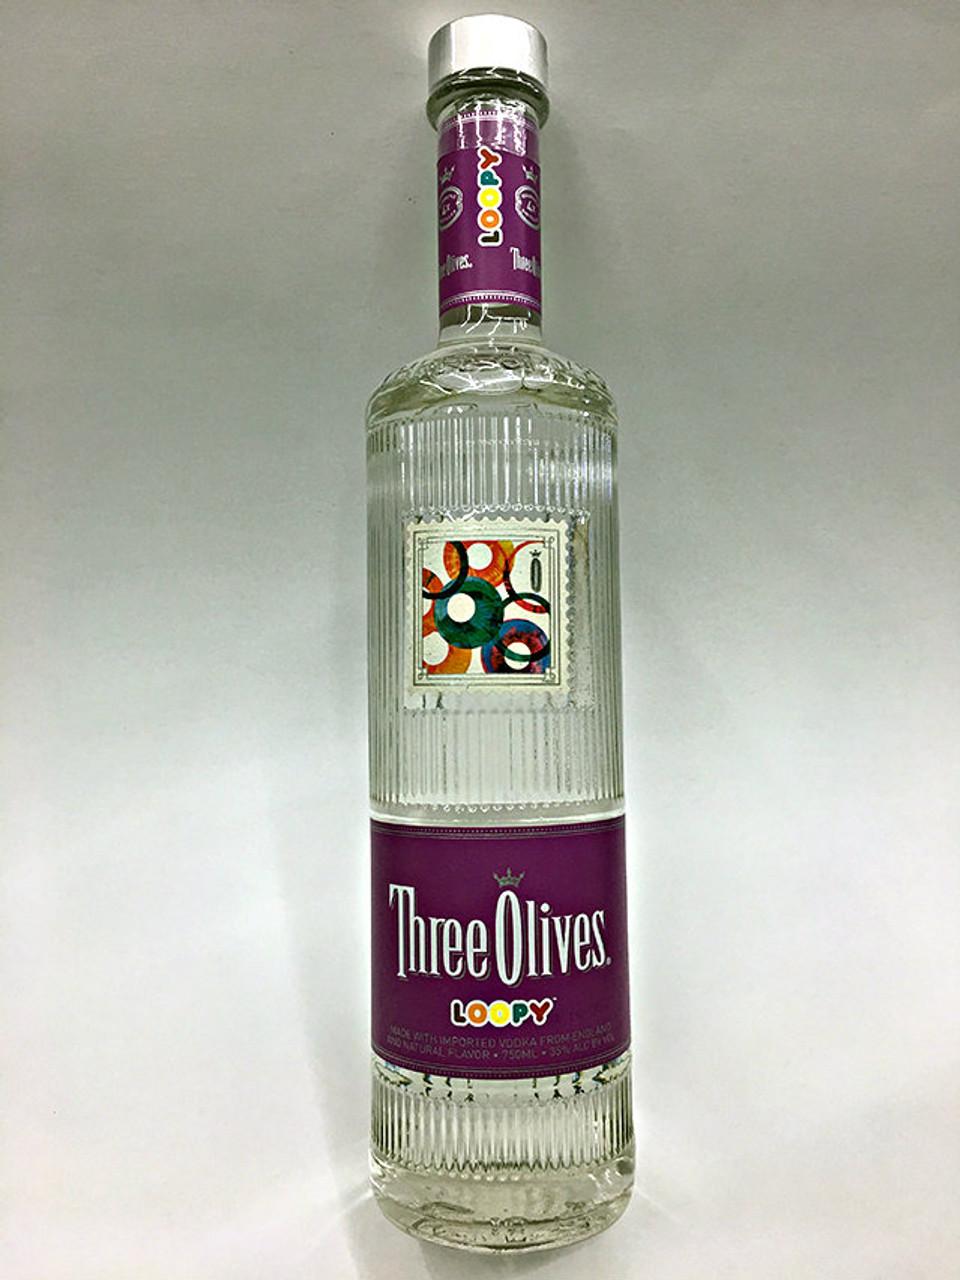 Three Olives Loopy Vodka 750ml